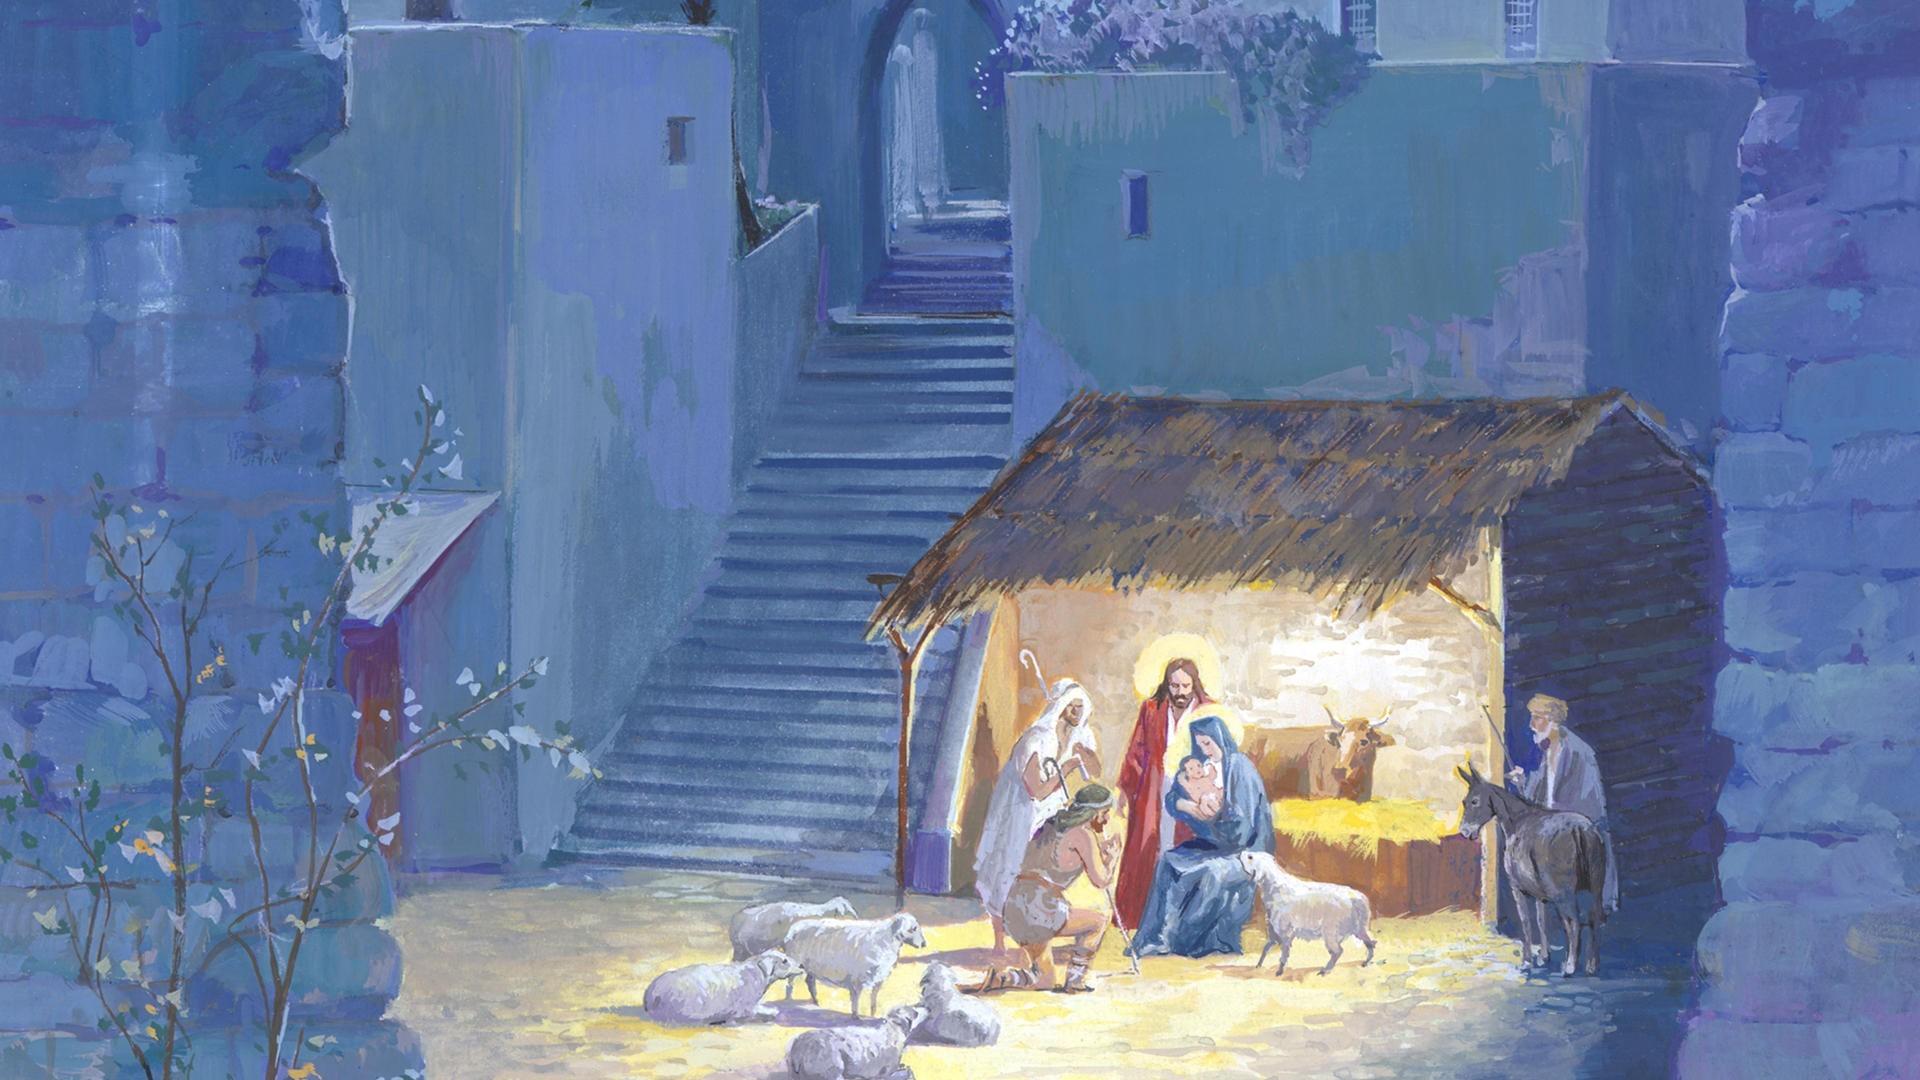 Christmas Love Ipad Air Wallpaper Download: Nativity Wallpaper ·① Download Free Beautiful Full HD